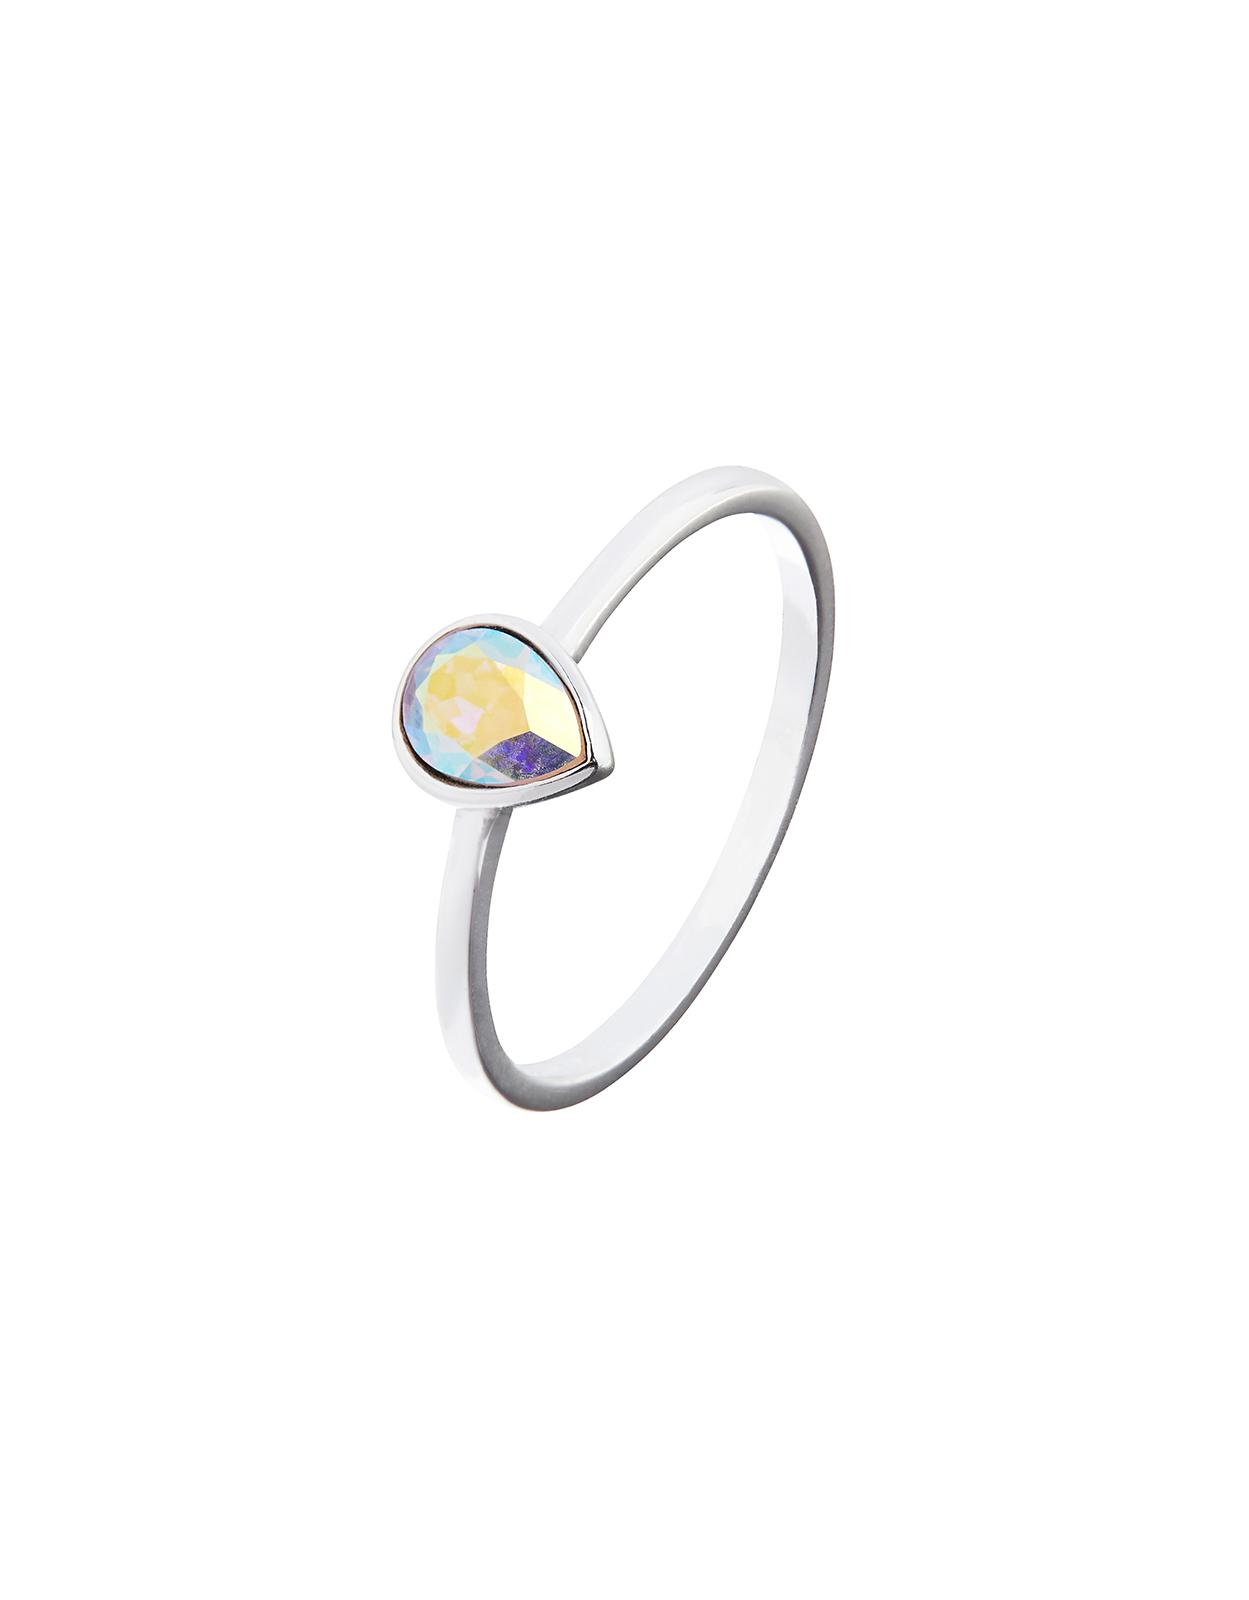 a54fe78e26788 Accessorize Metallic Sterling Silver Teardrop Ring With Swarovski® Crystal